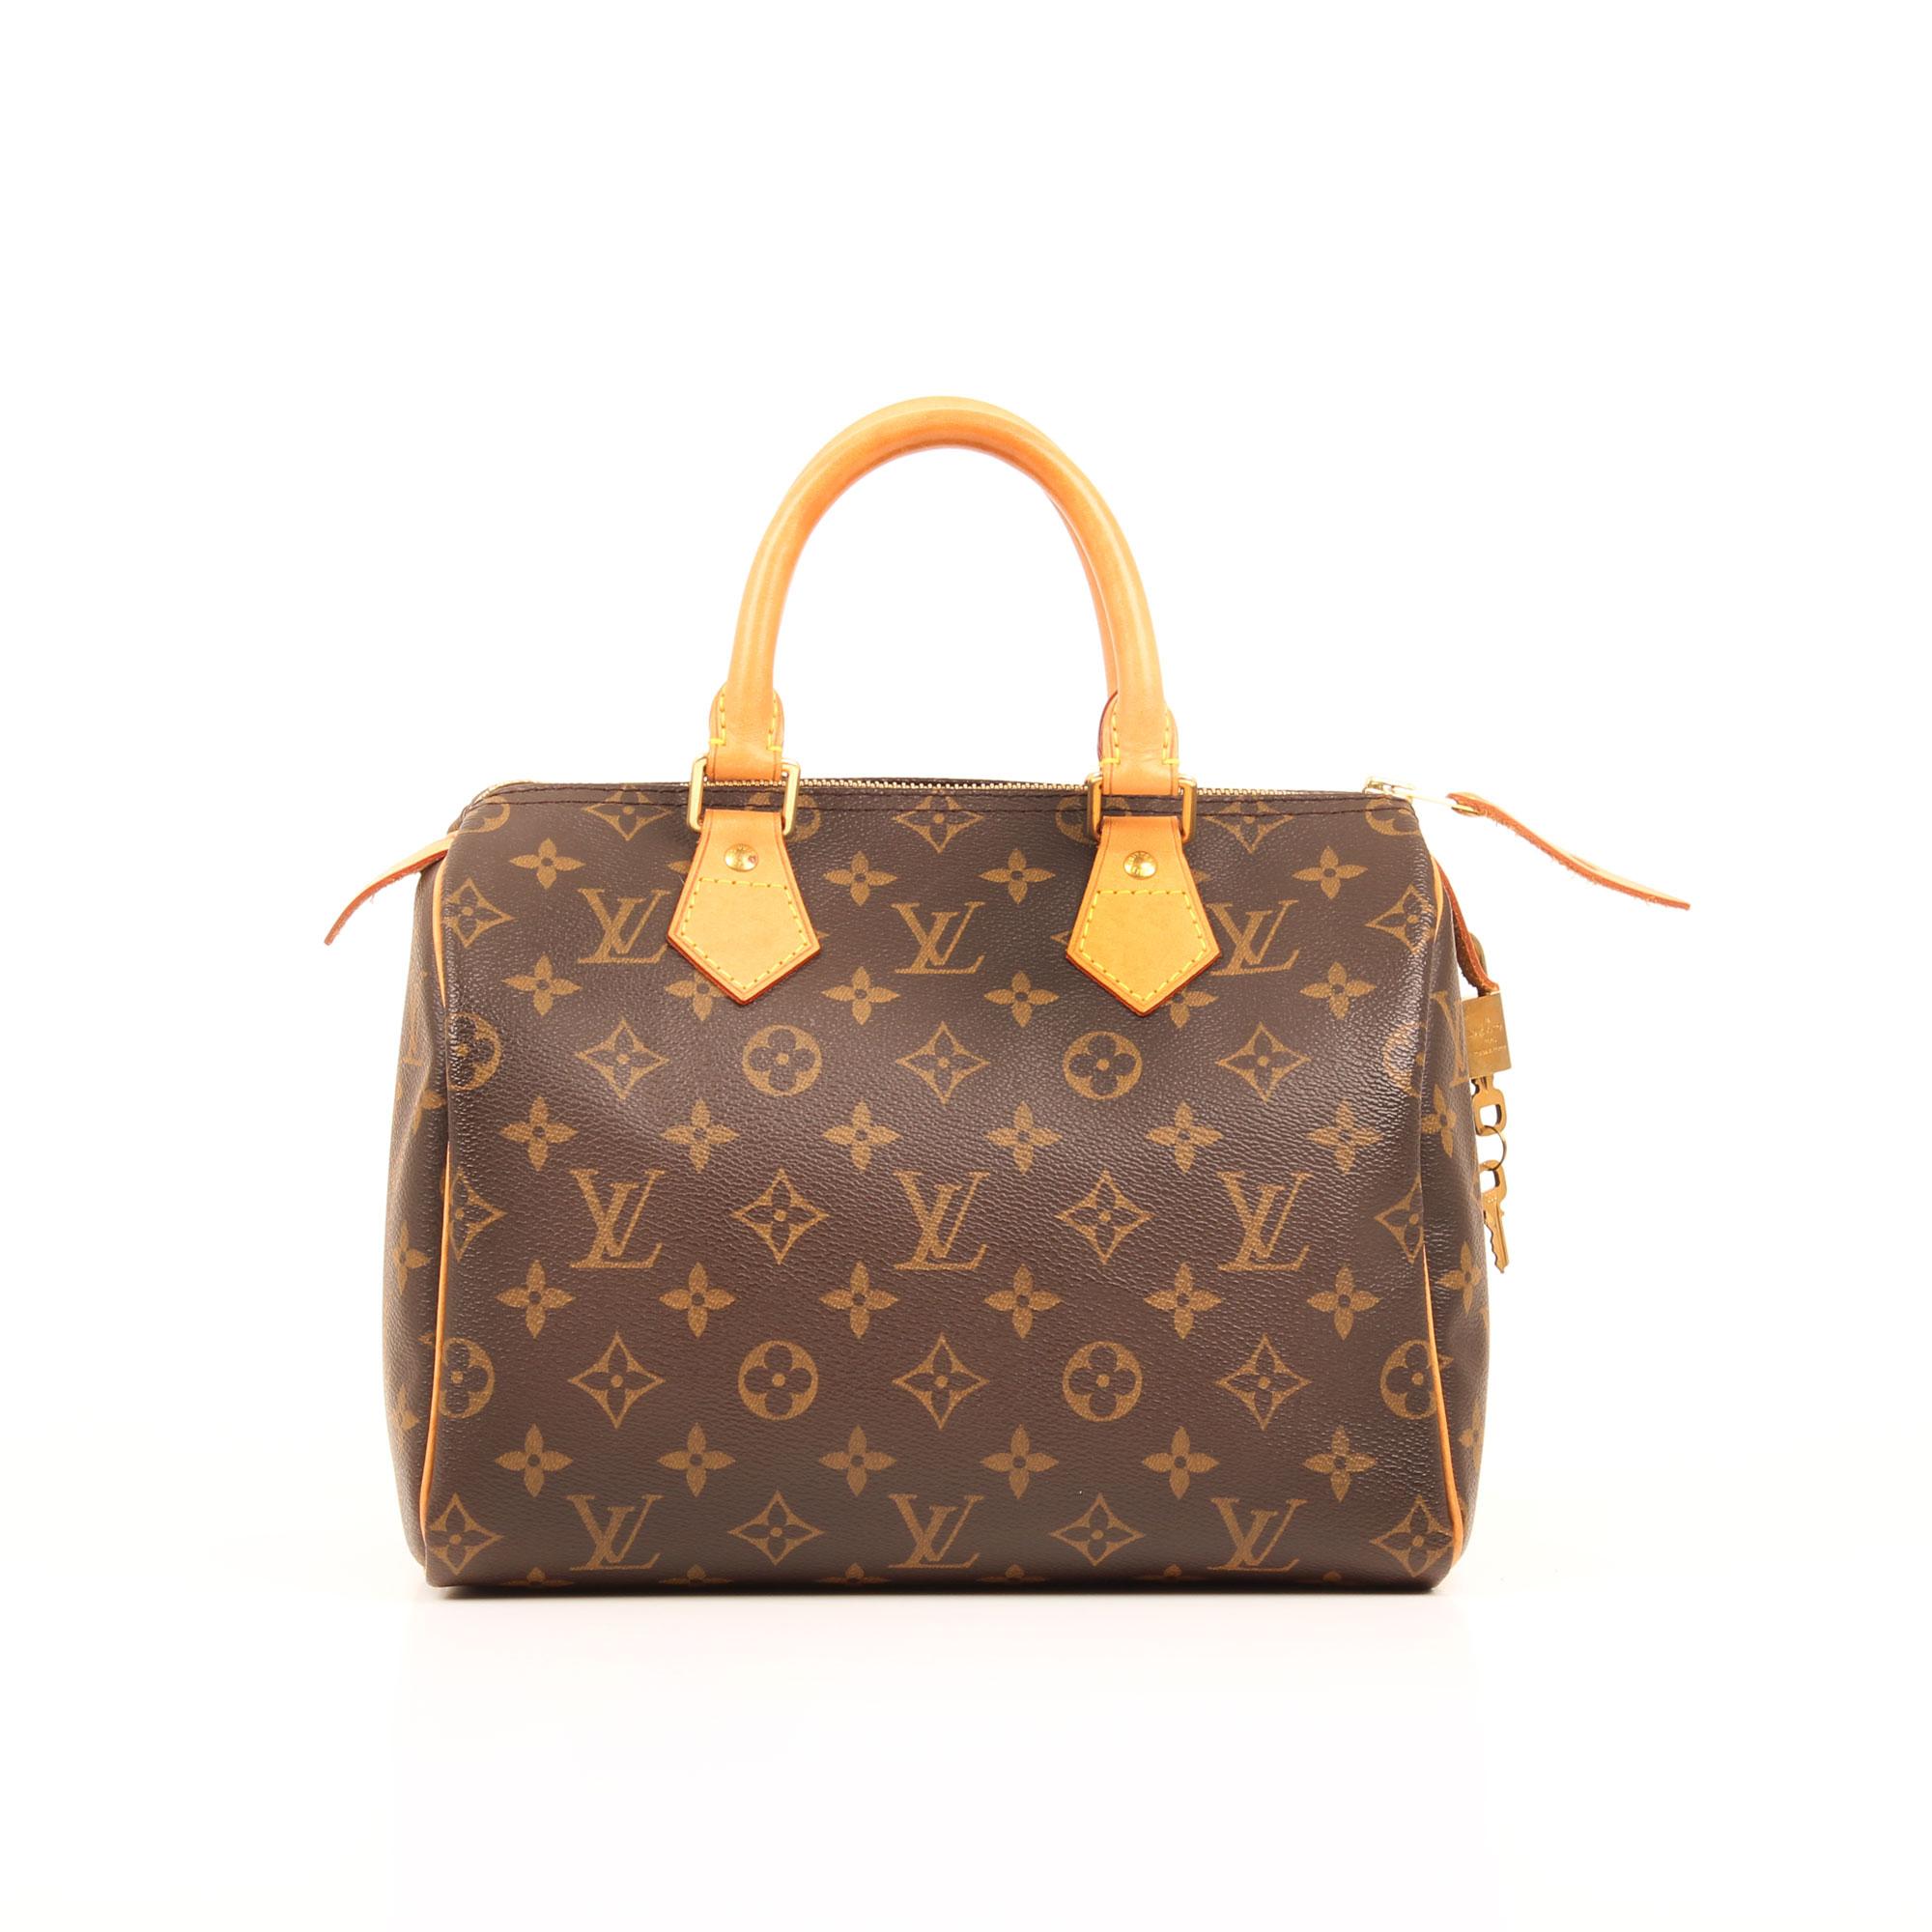 handbag louis vuitton speedy 25 monogram front